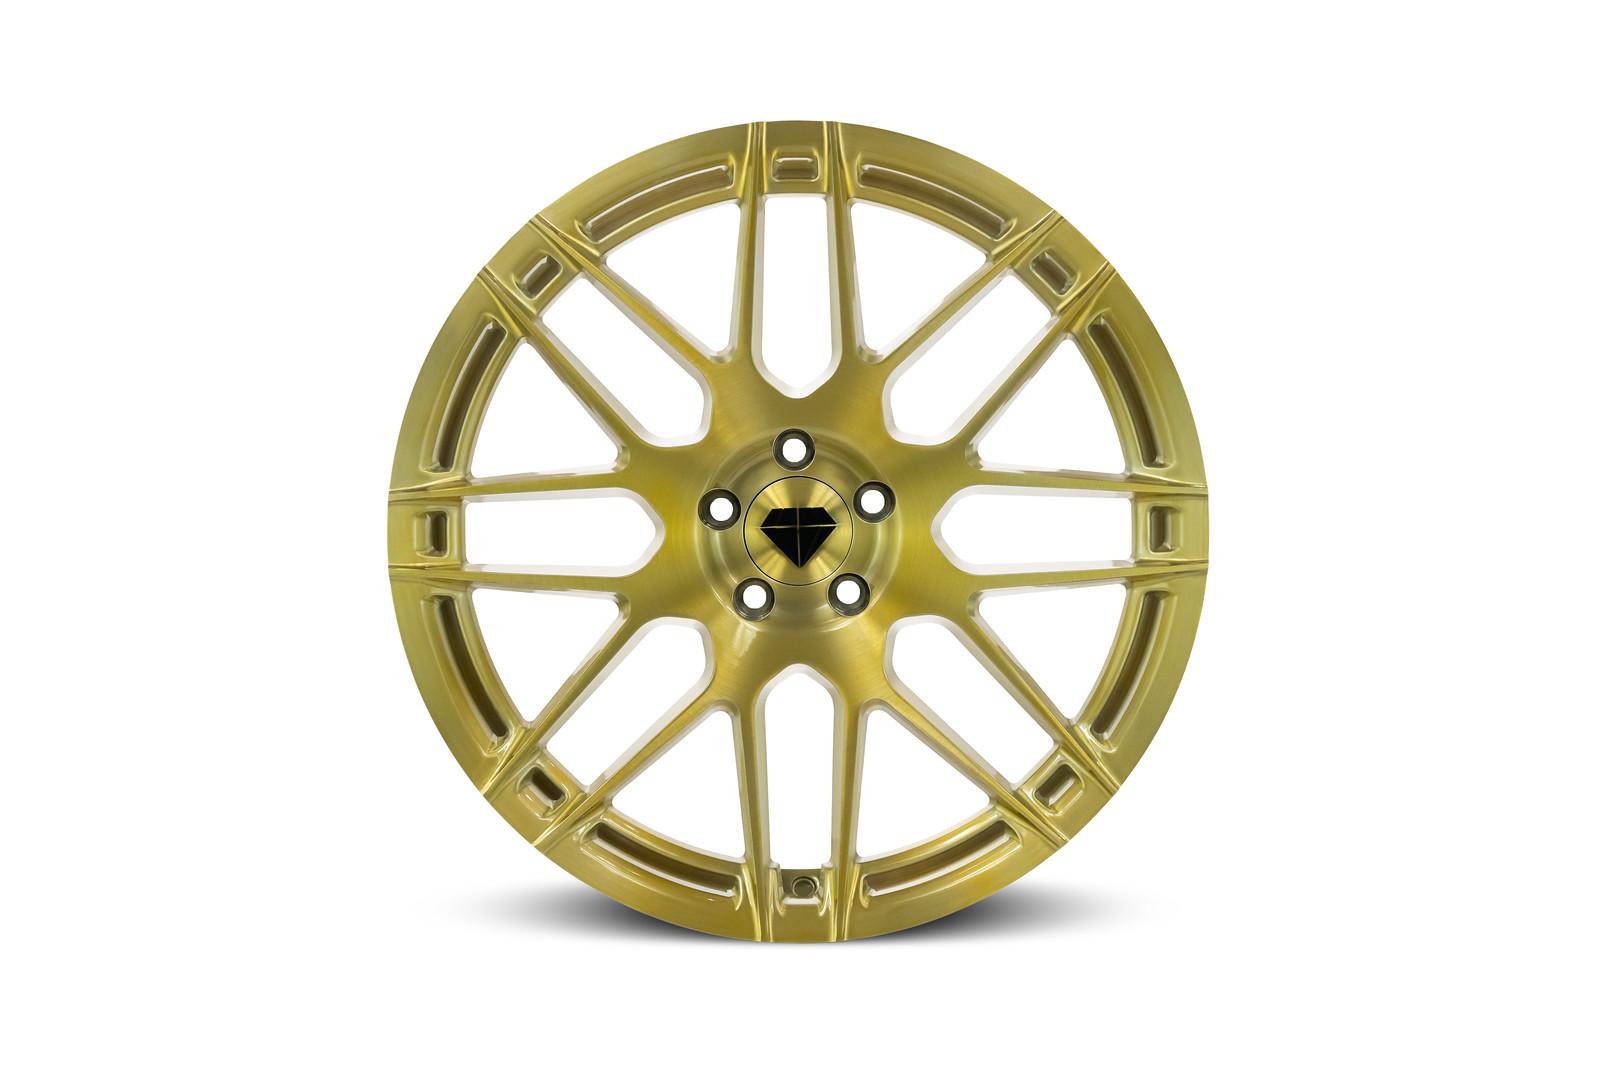 BDF12_Custom_Finish_Transparent_Brassy_Clear_Gold_2